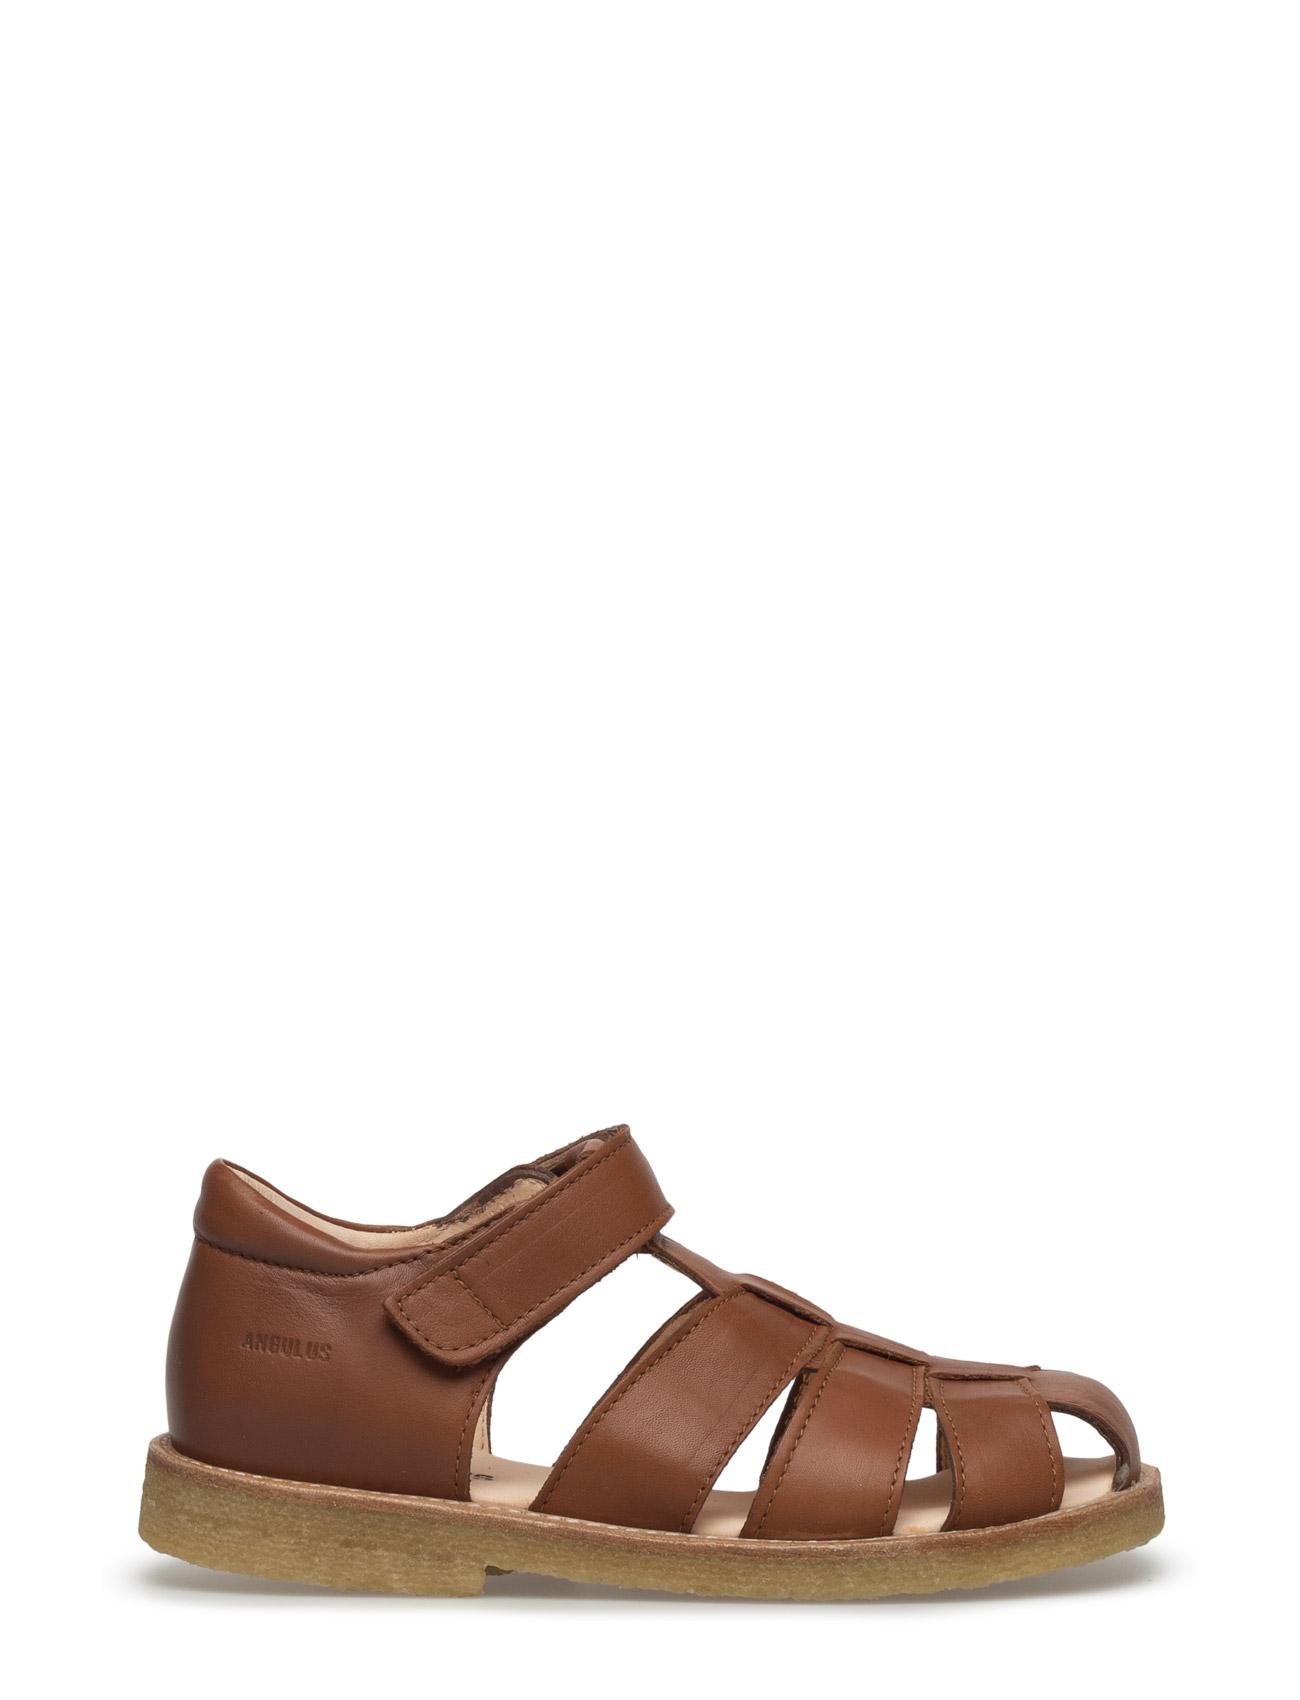 29b1ad85fa73 1431 COGNAC ANGULUS 5026 sandaler for børn - Pashion.dk